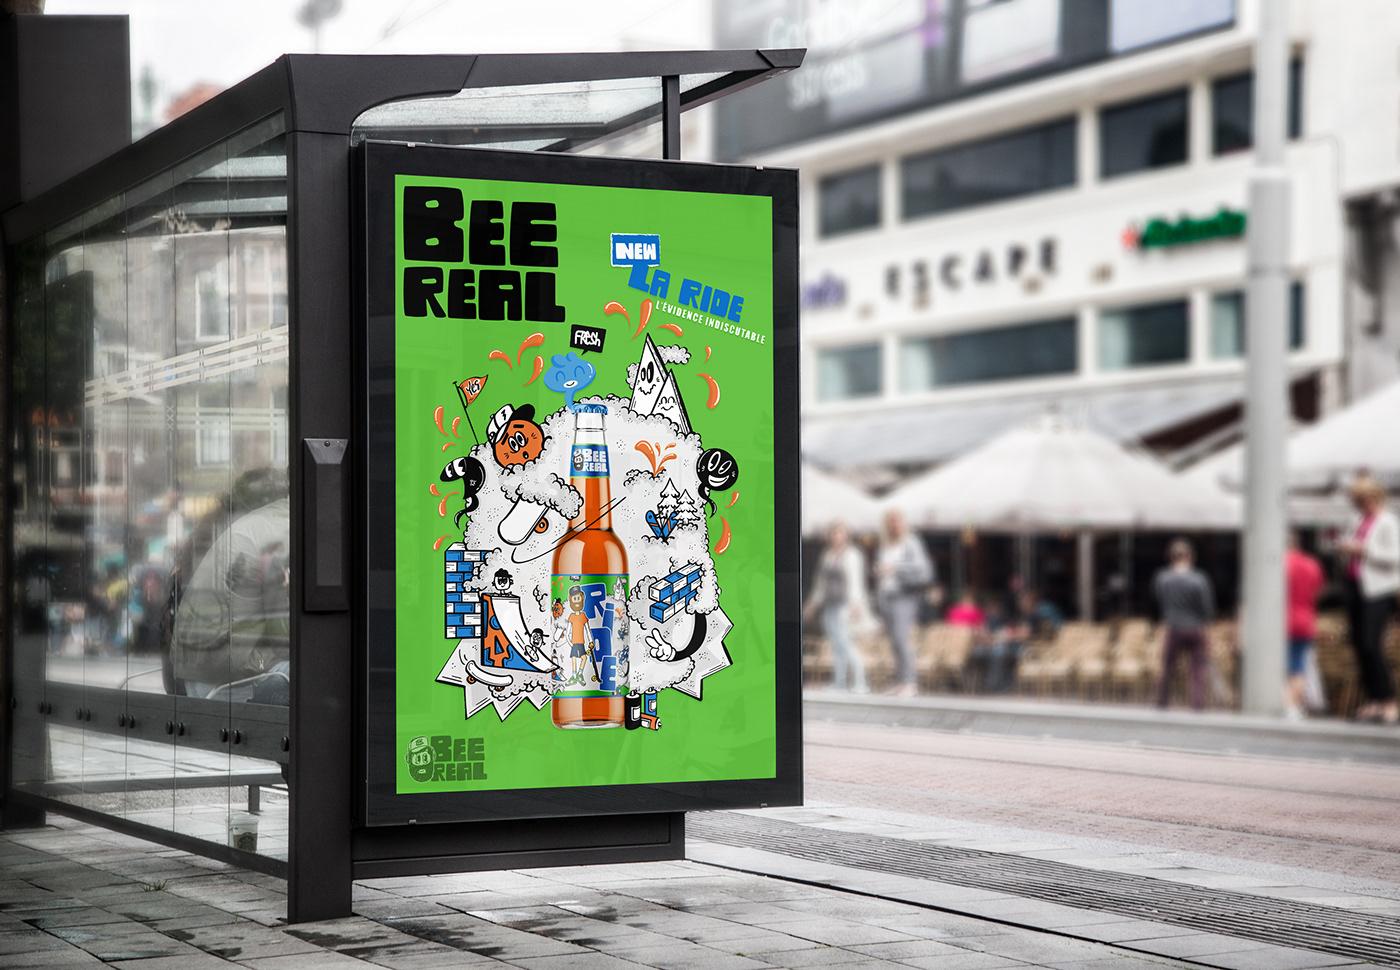 Image may contain: outdoor, cartoon and billboard